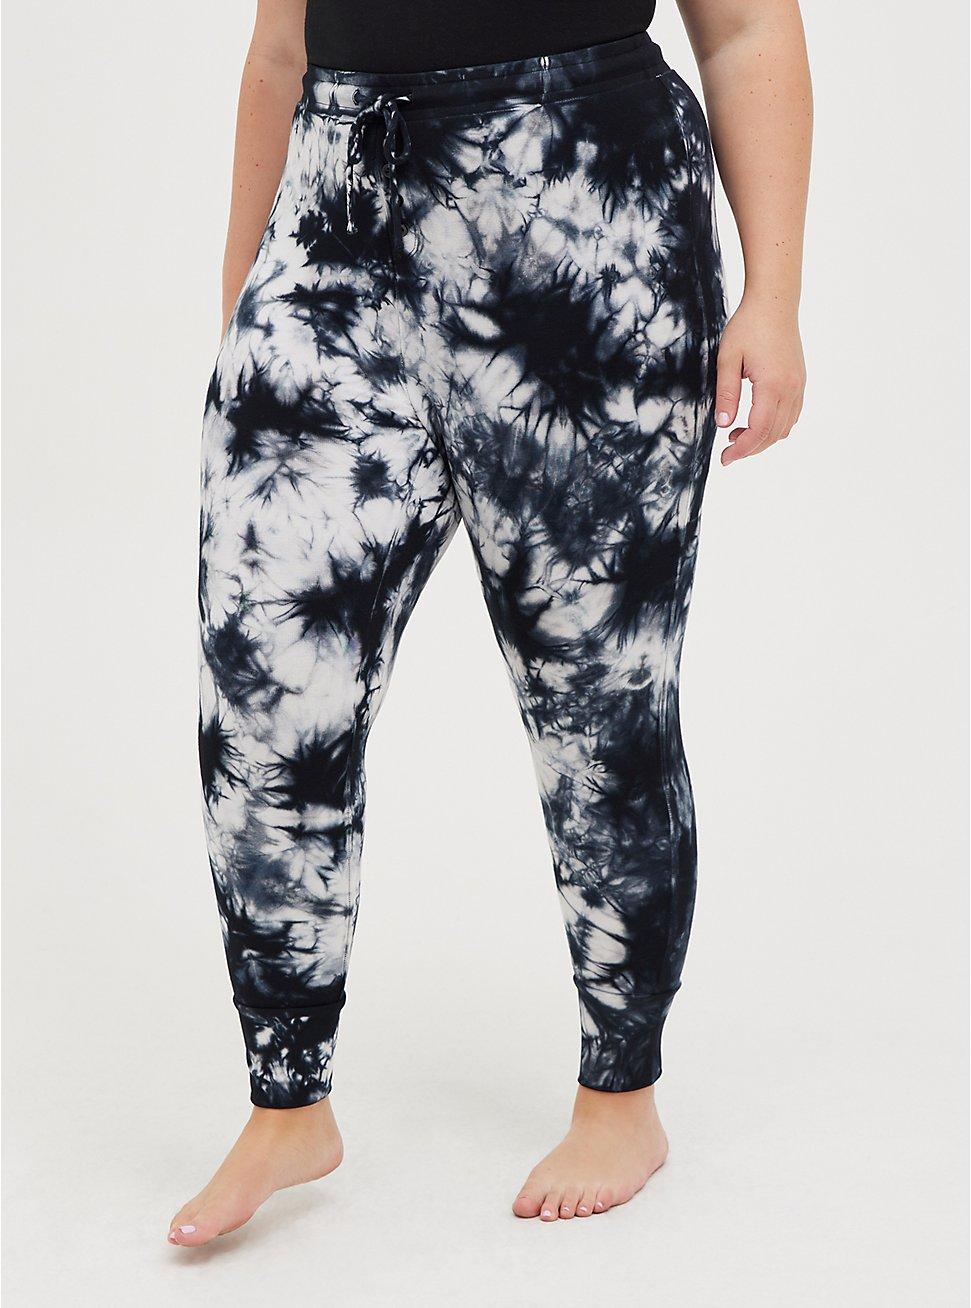 Sleep Legging - Micro Modal Tie Dye Black & White, MULTI, hi-res